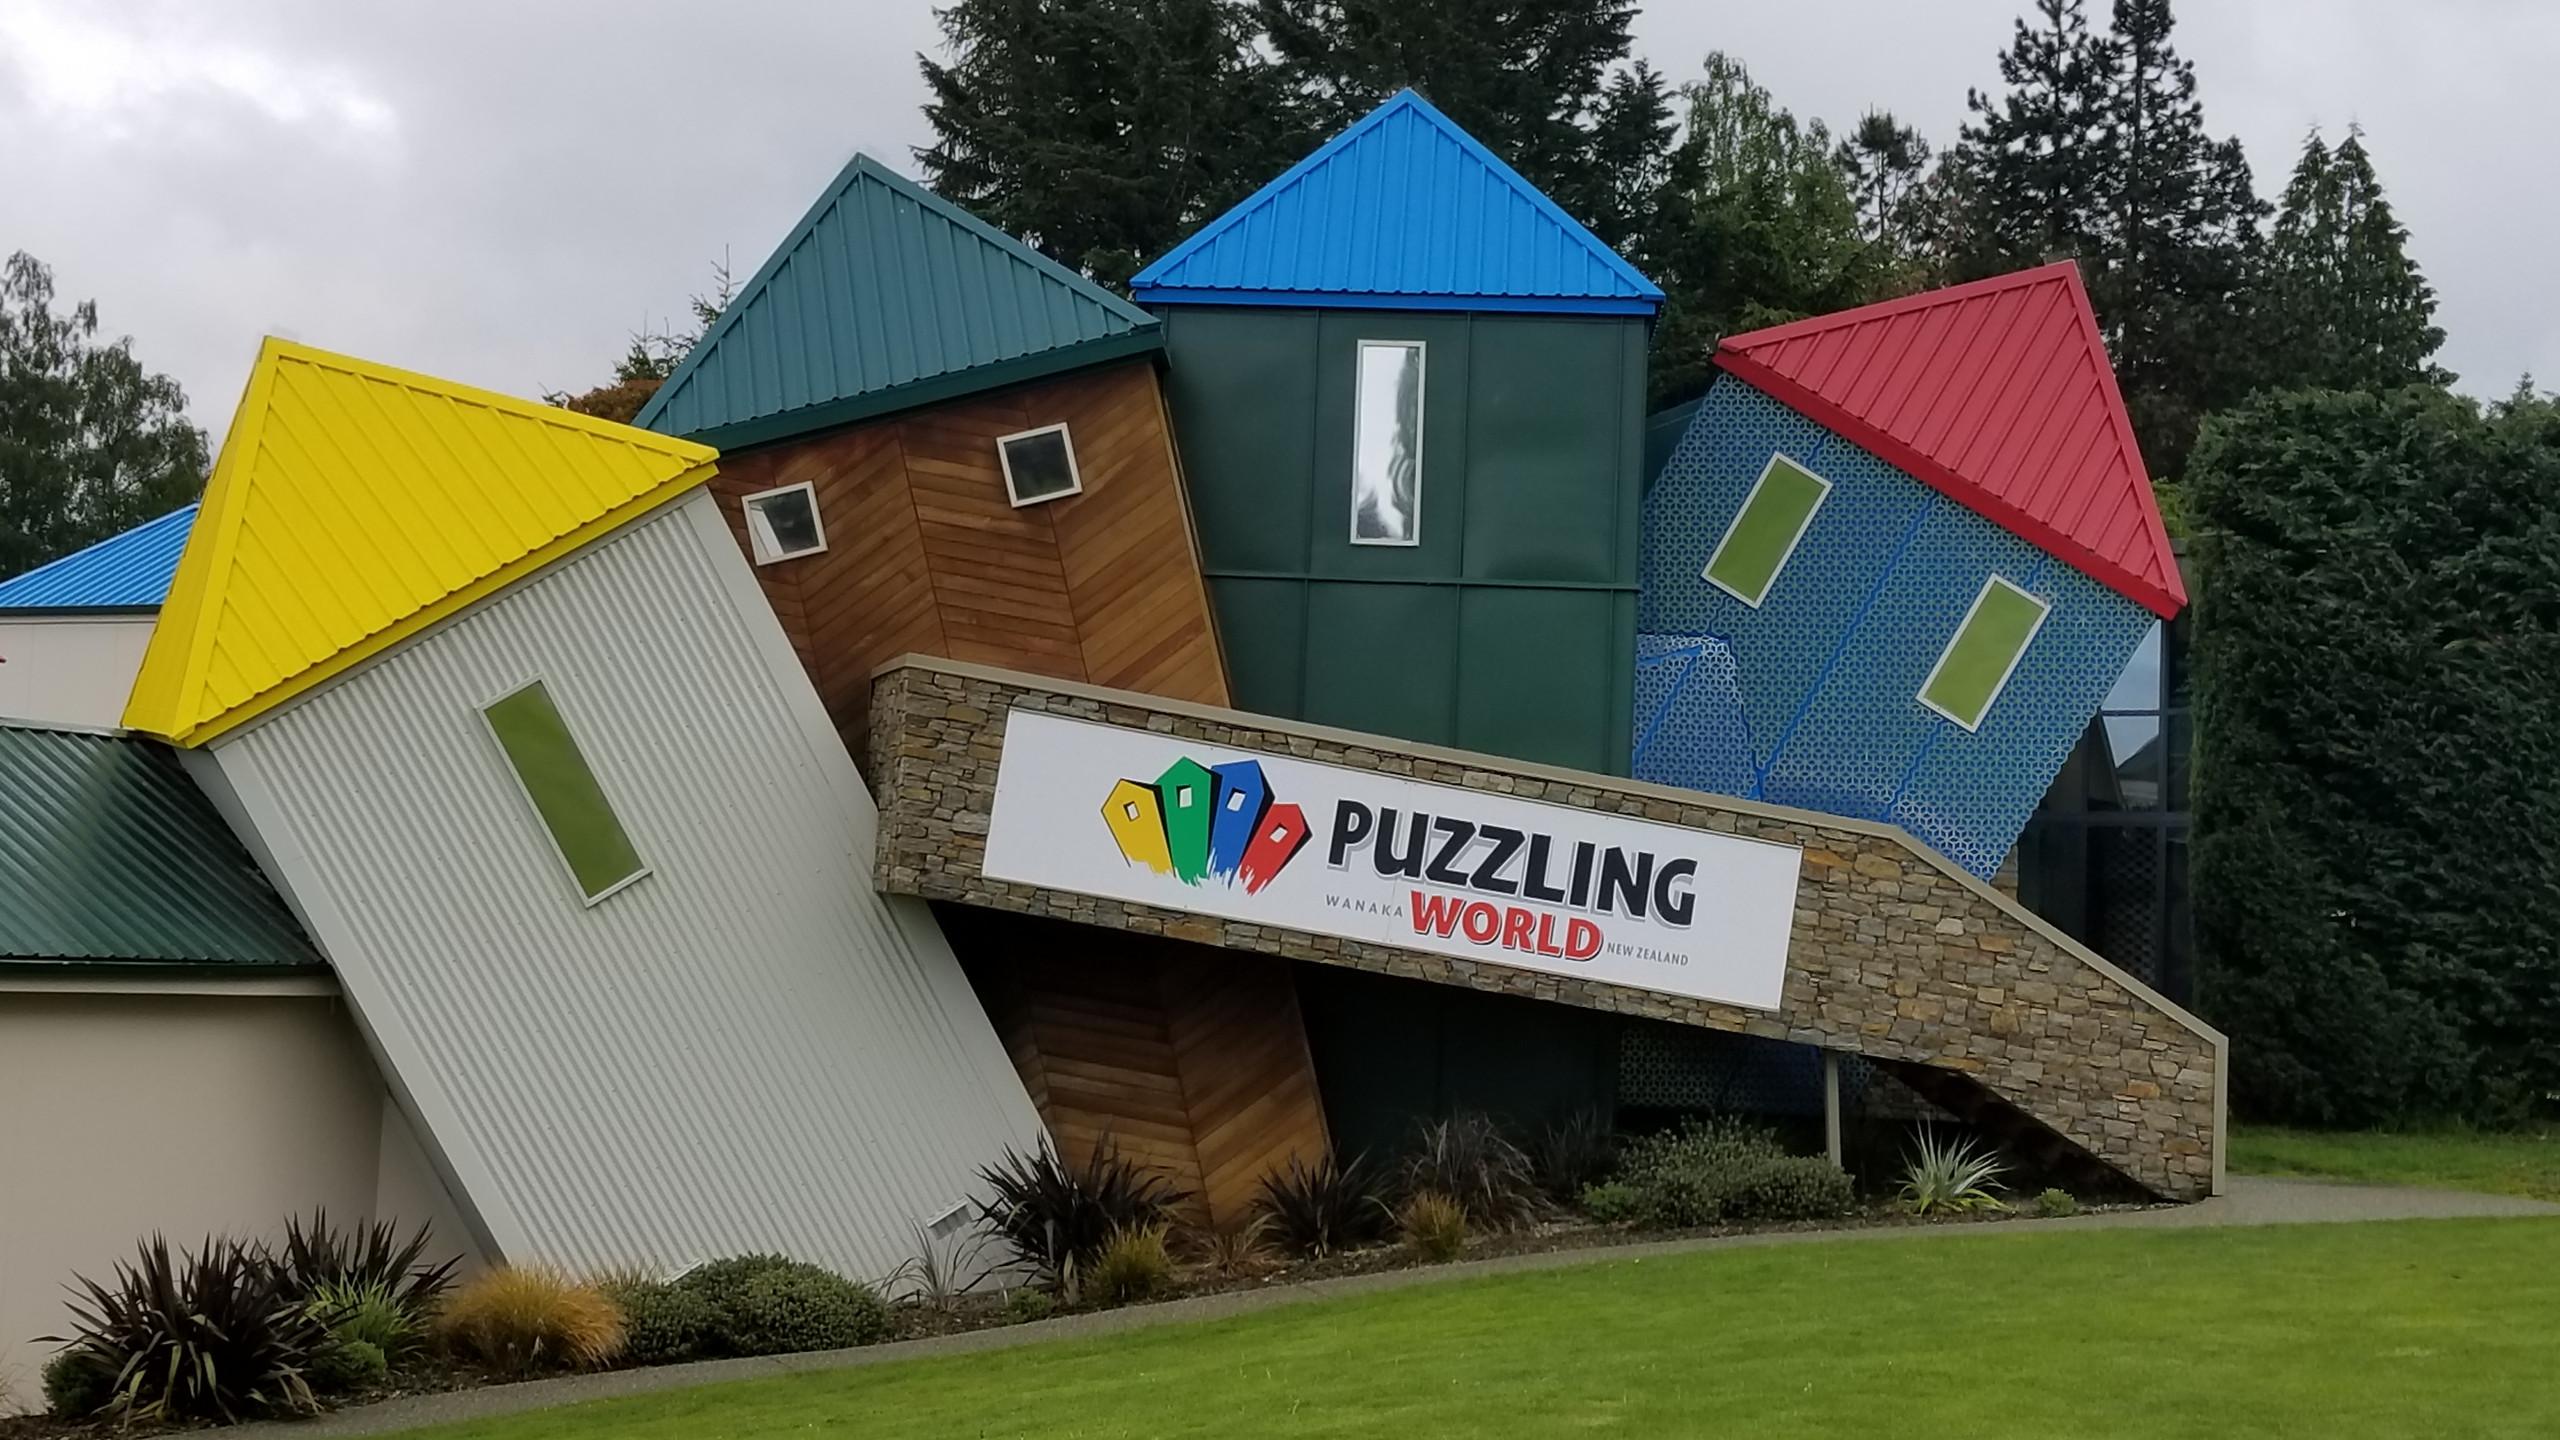 Puzzling World Wanaka, New Zealand activities, New Zealand tours